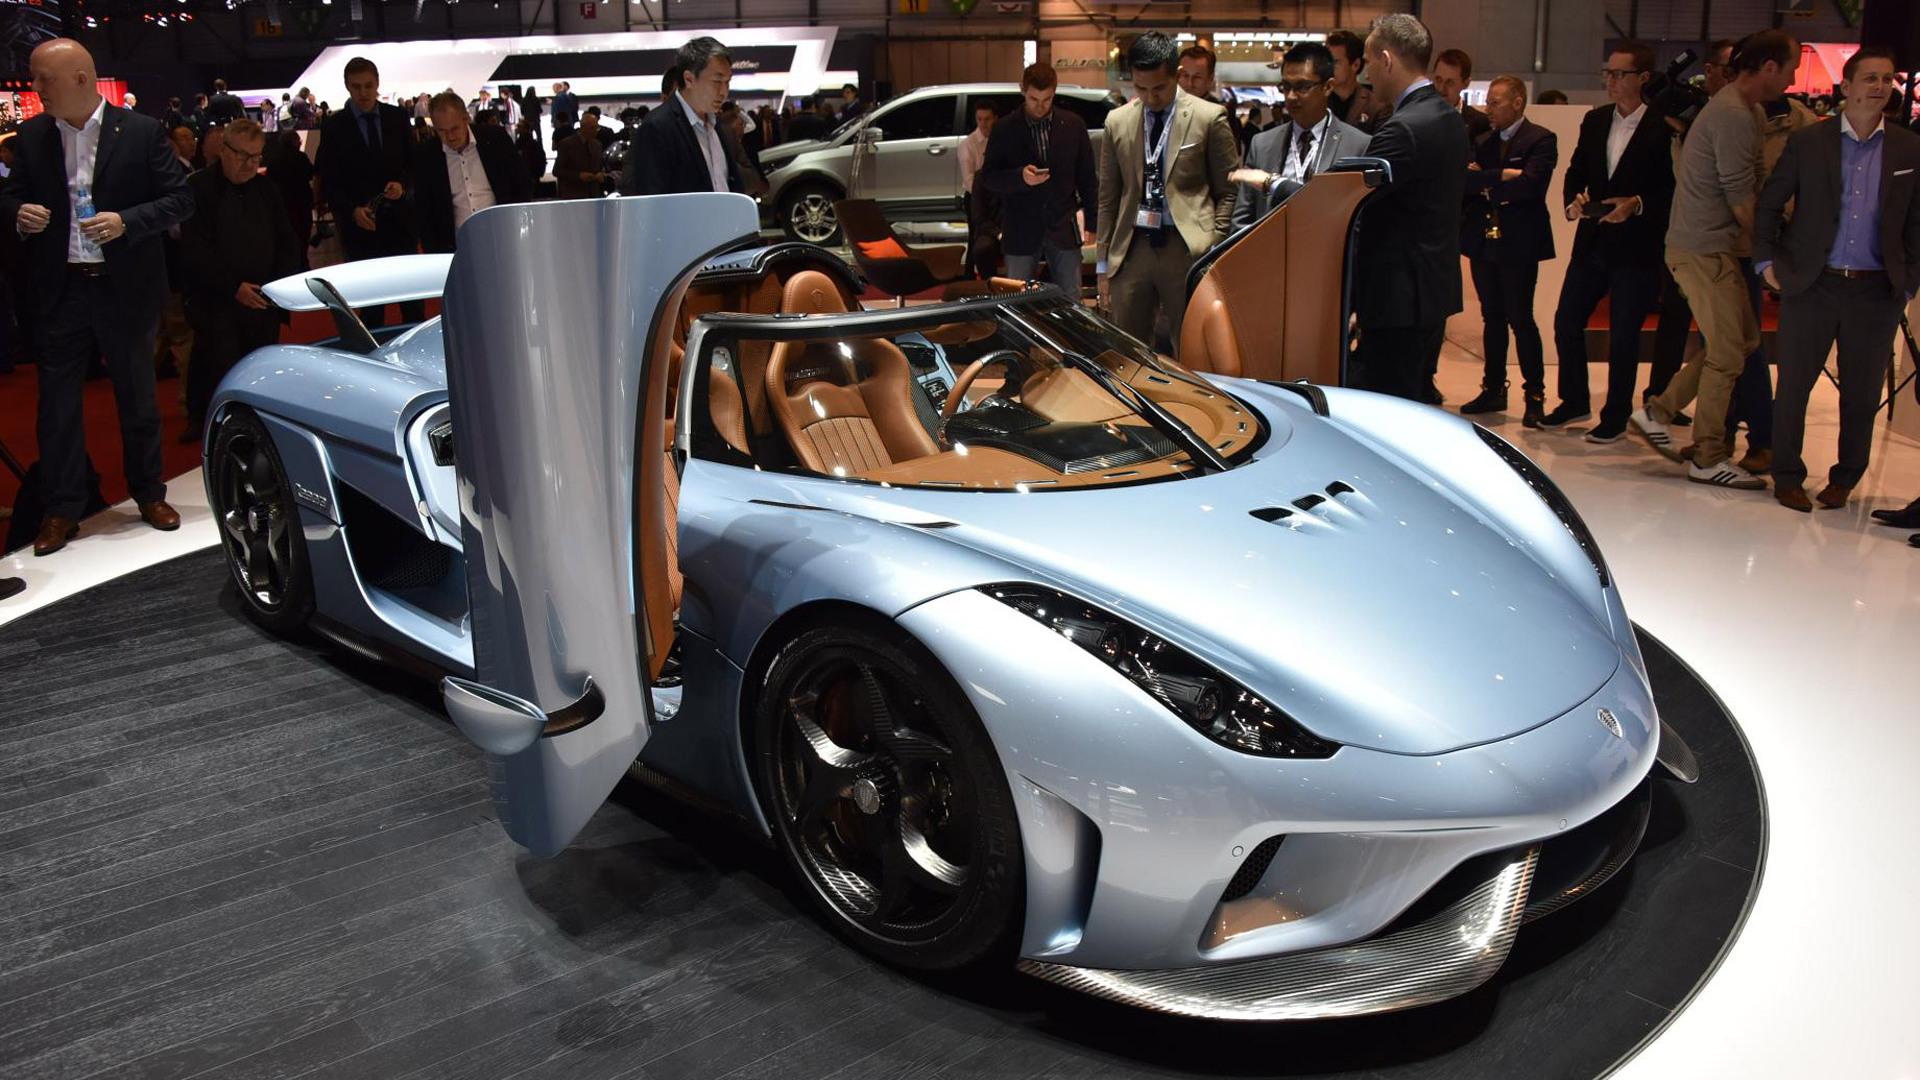 U K Dealer Lists Koenigsegg Regera At 2 1 Millon Euros In Online Ad